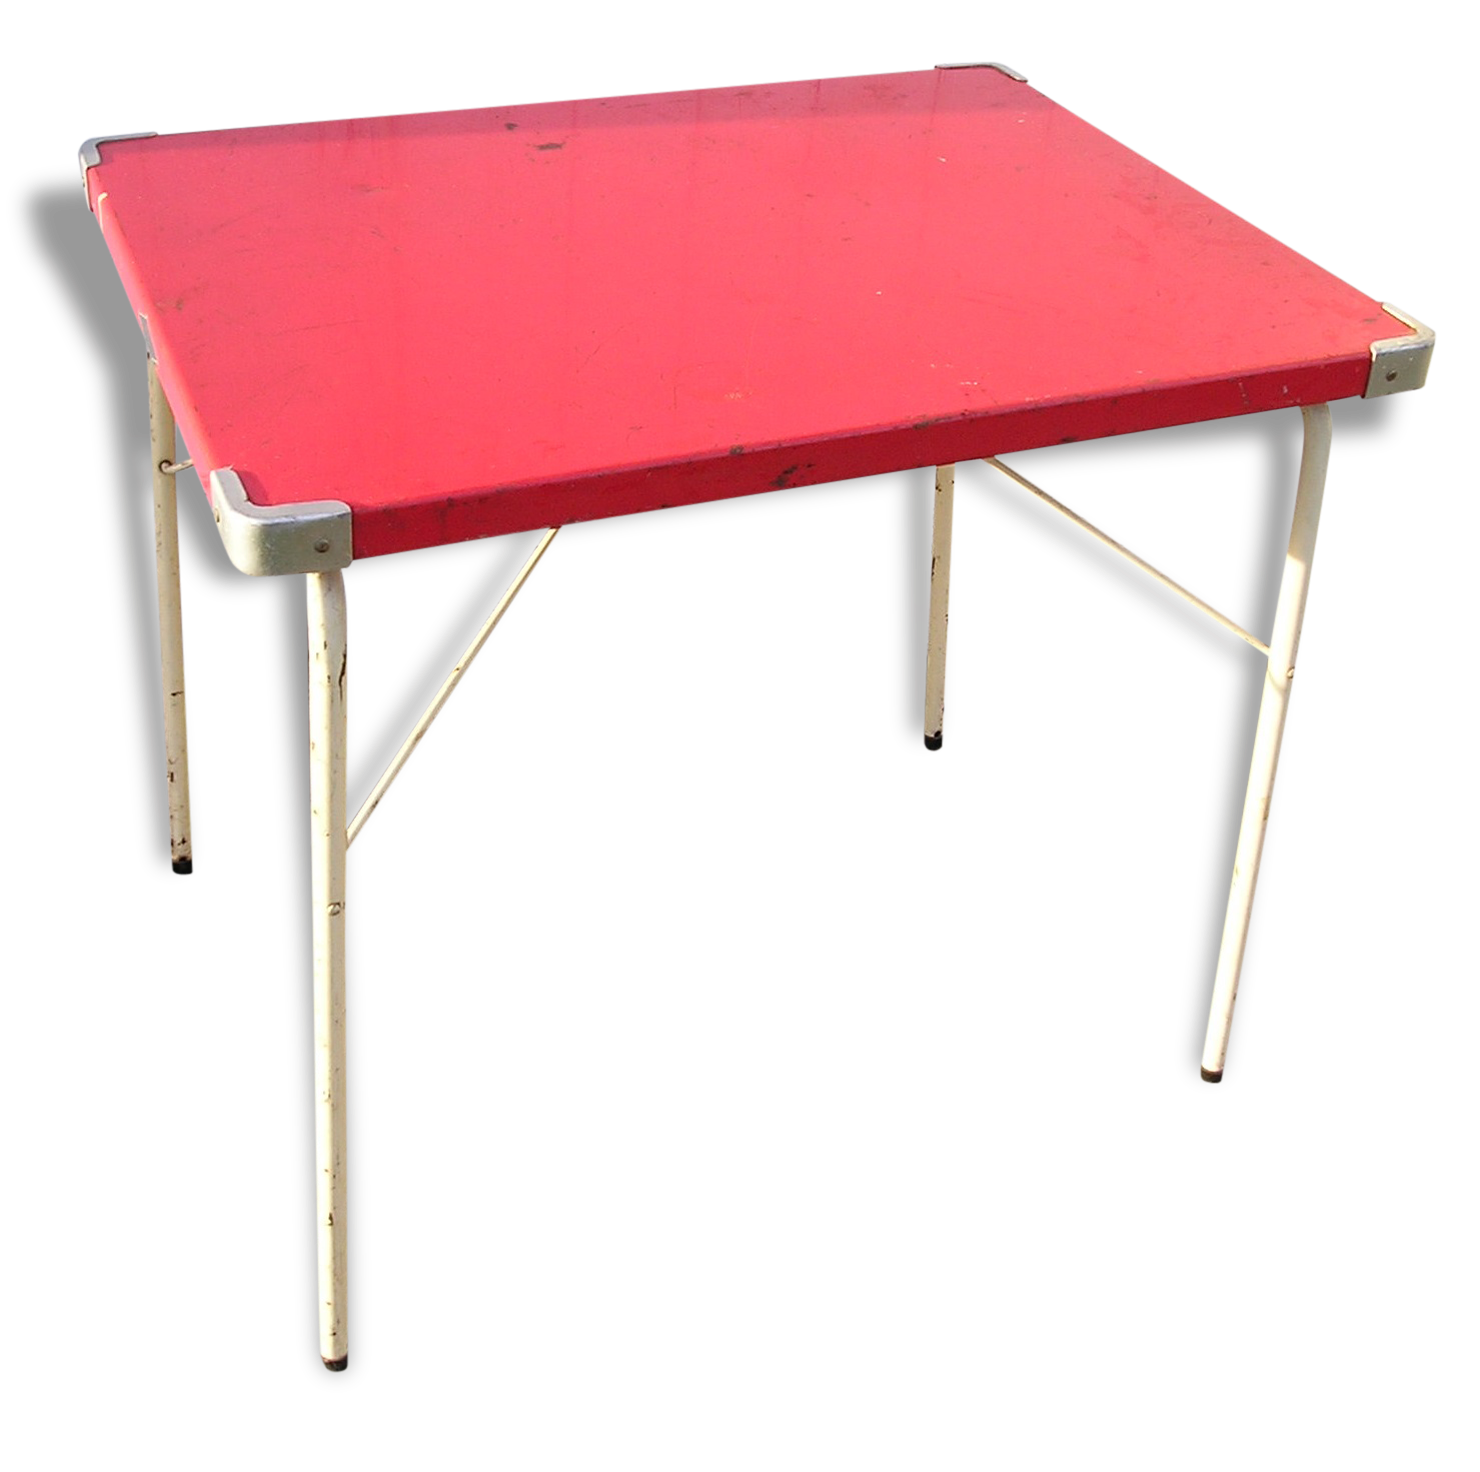 Petite table pliante awesome petite table jardin pliante - Petite table de jardin pliante en plastique ...